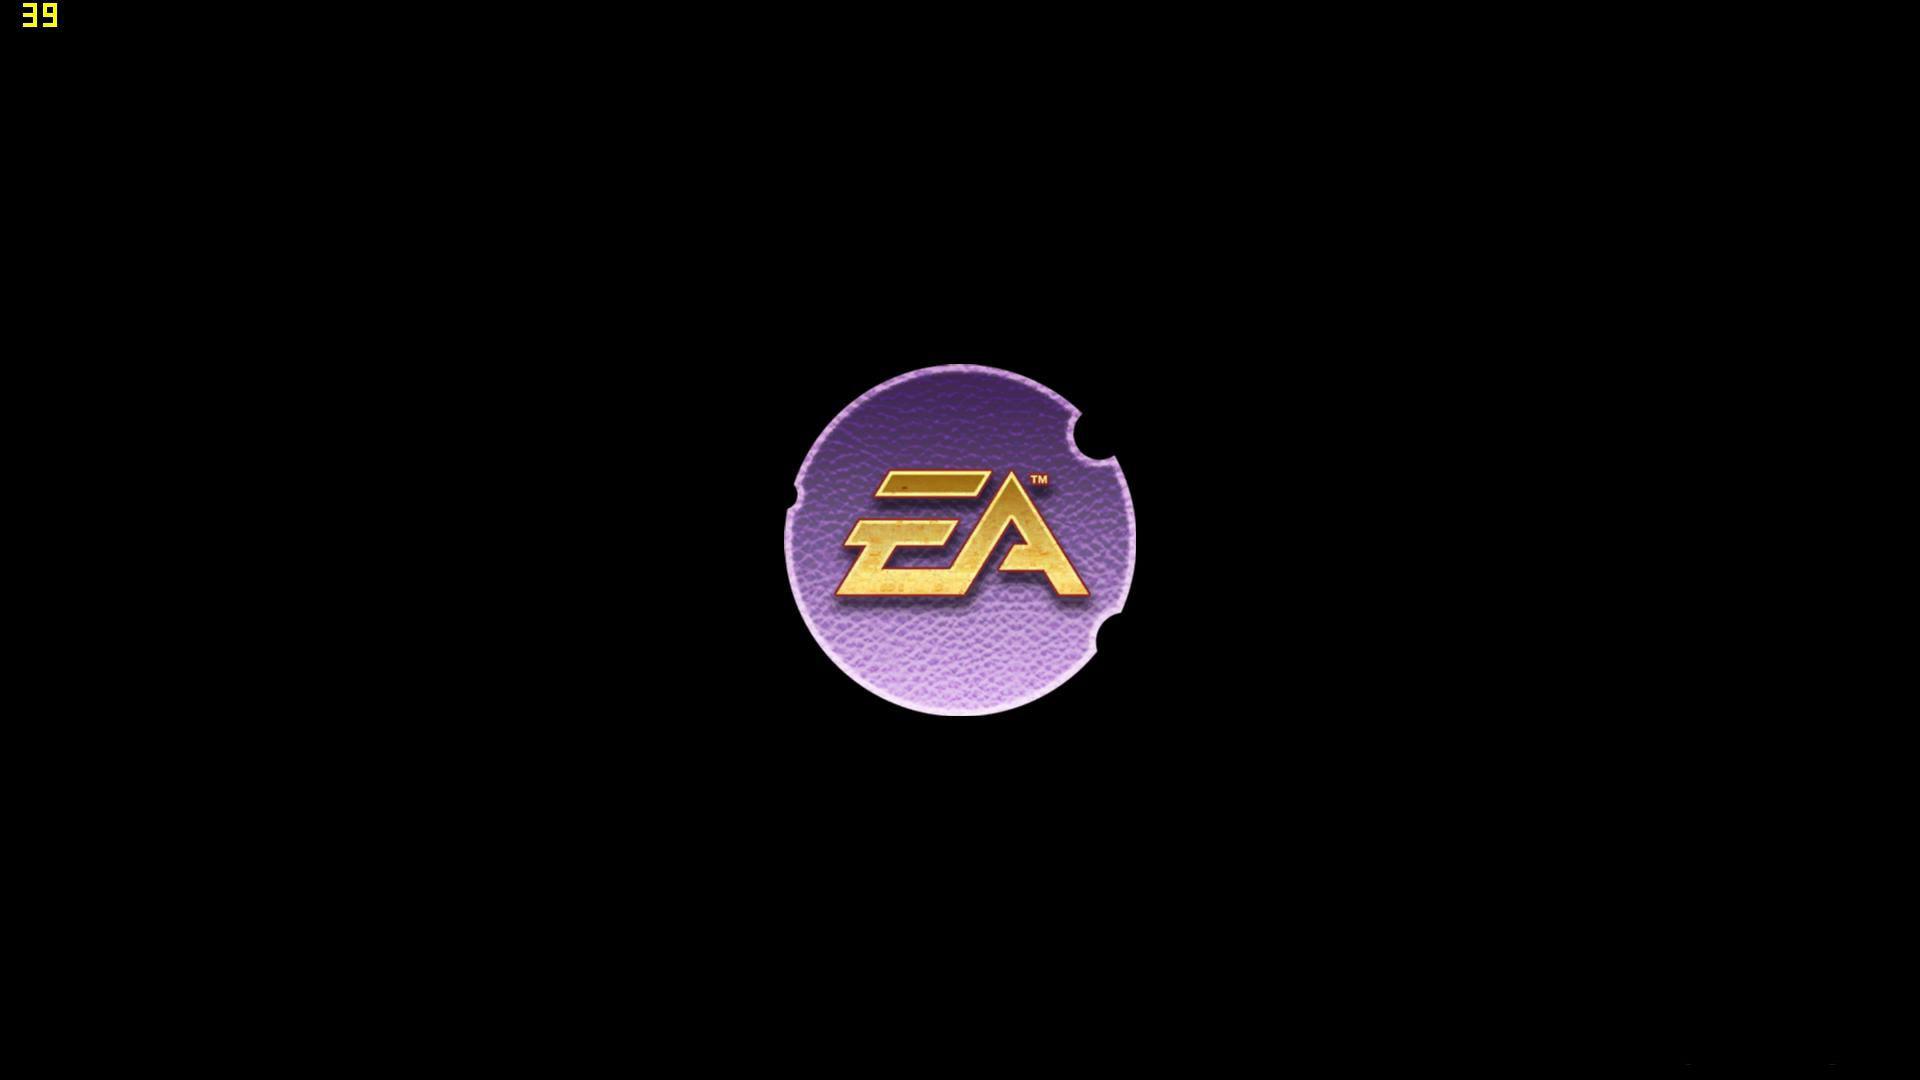 ea系列游戏各类奇葩logo图标